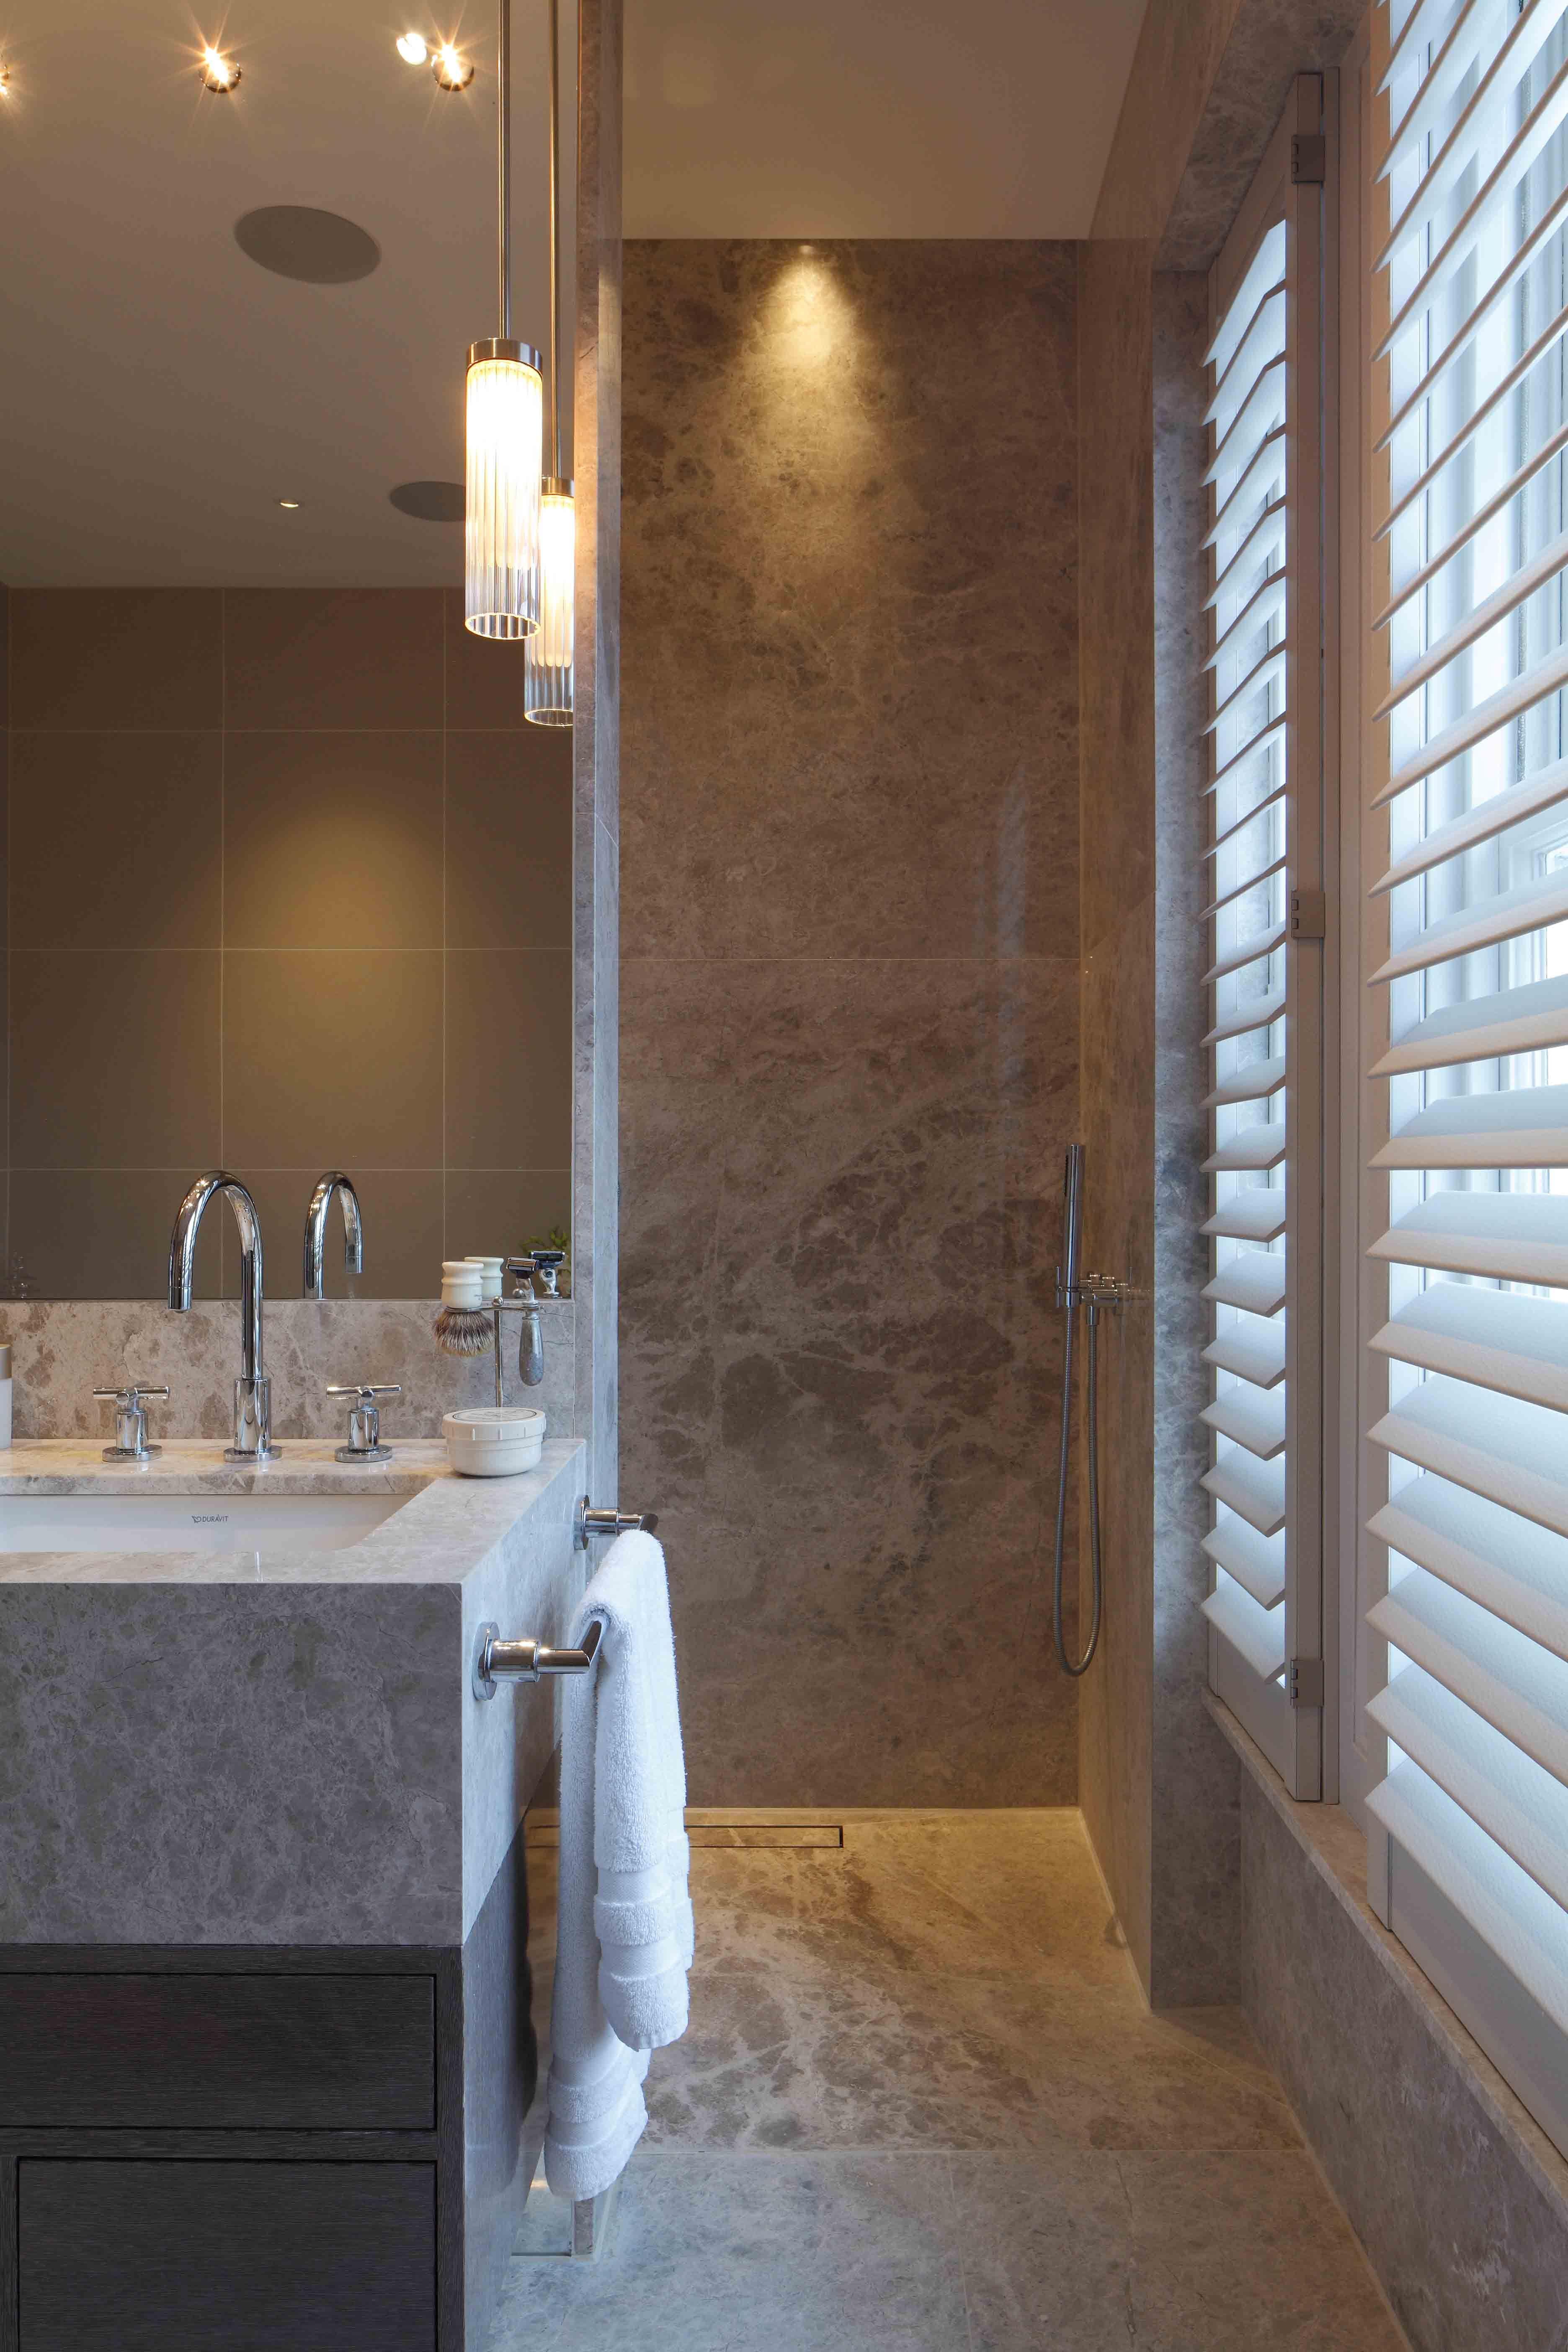 Bathroom Lighting Design by John Cullen Lighting | Bathroom Lighting ...